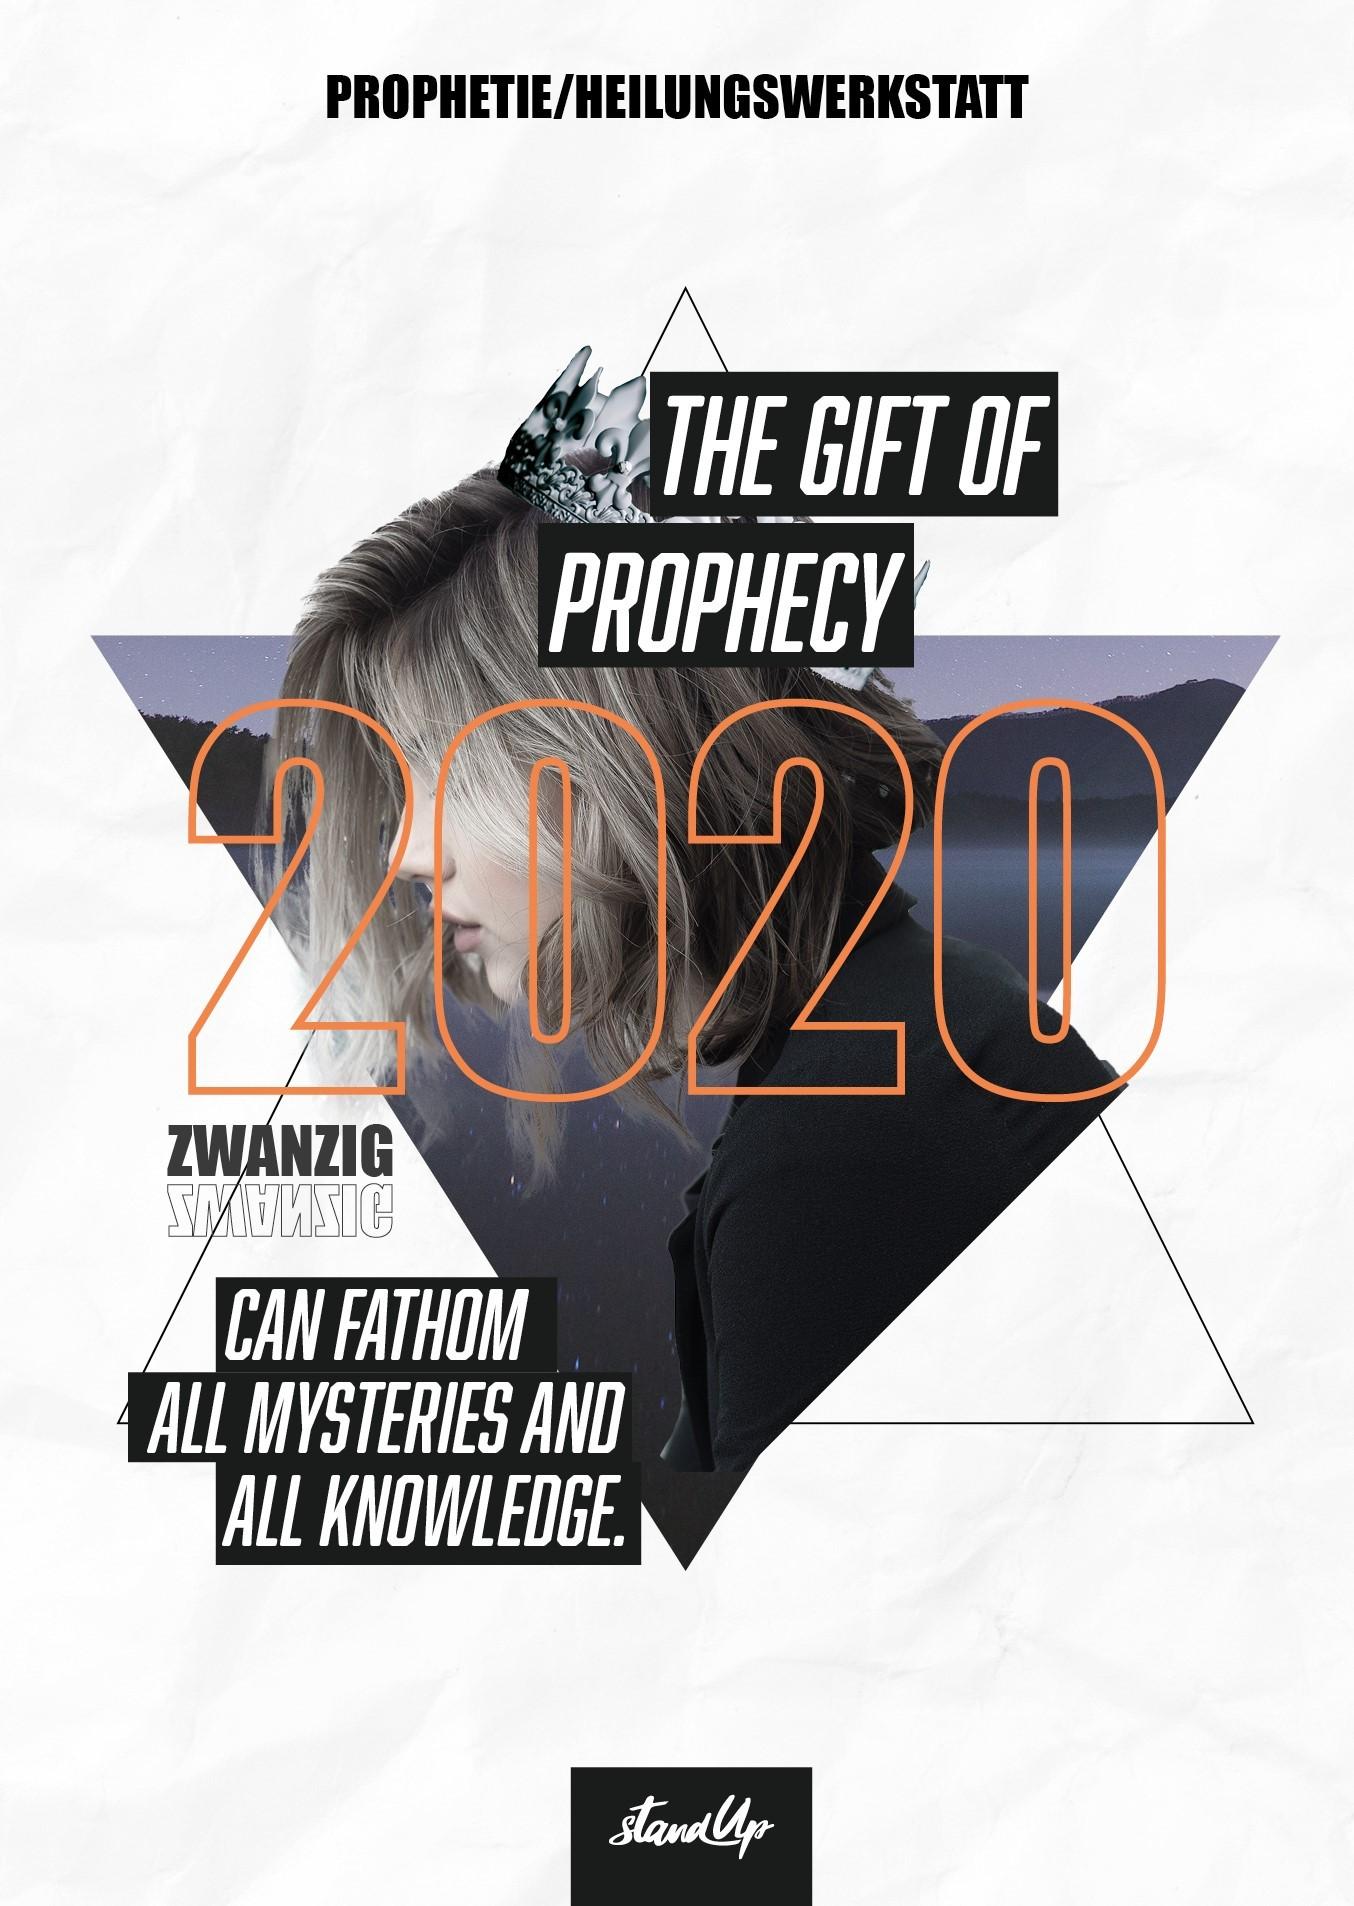 Prophetiewerkstatt mit Heilungswerkstatt